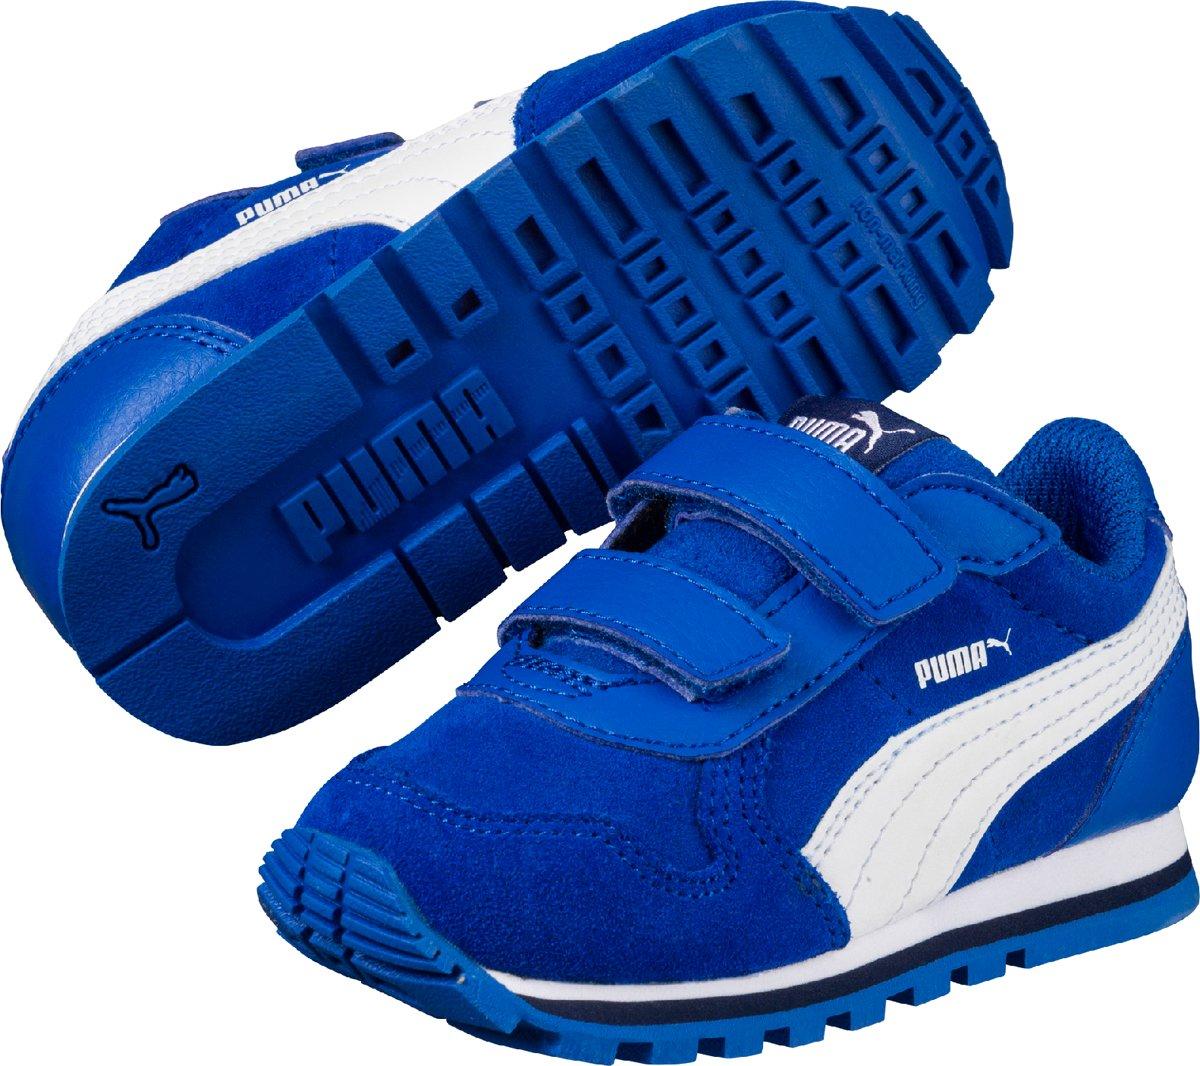 PUMA Sneakers ST Runner SD V voor €15,98